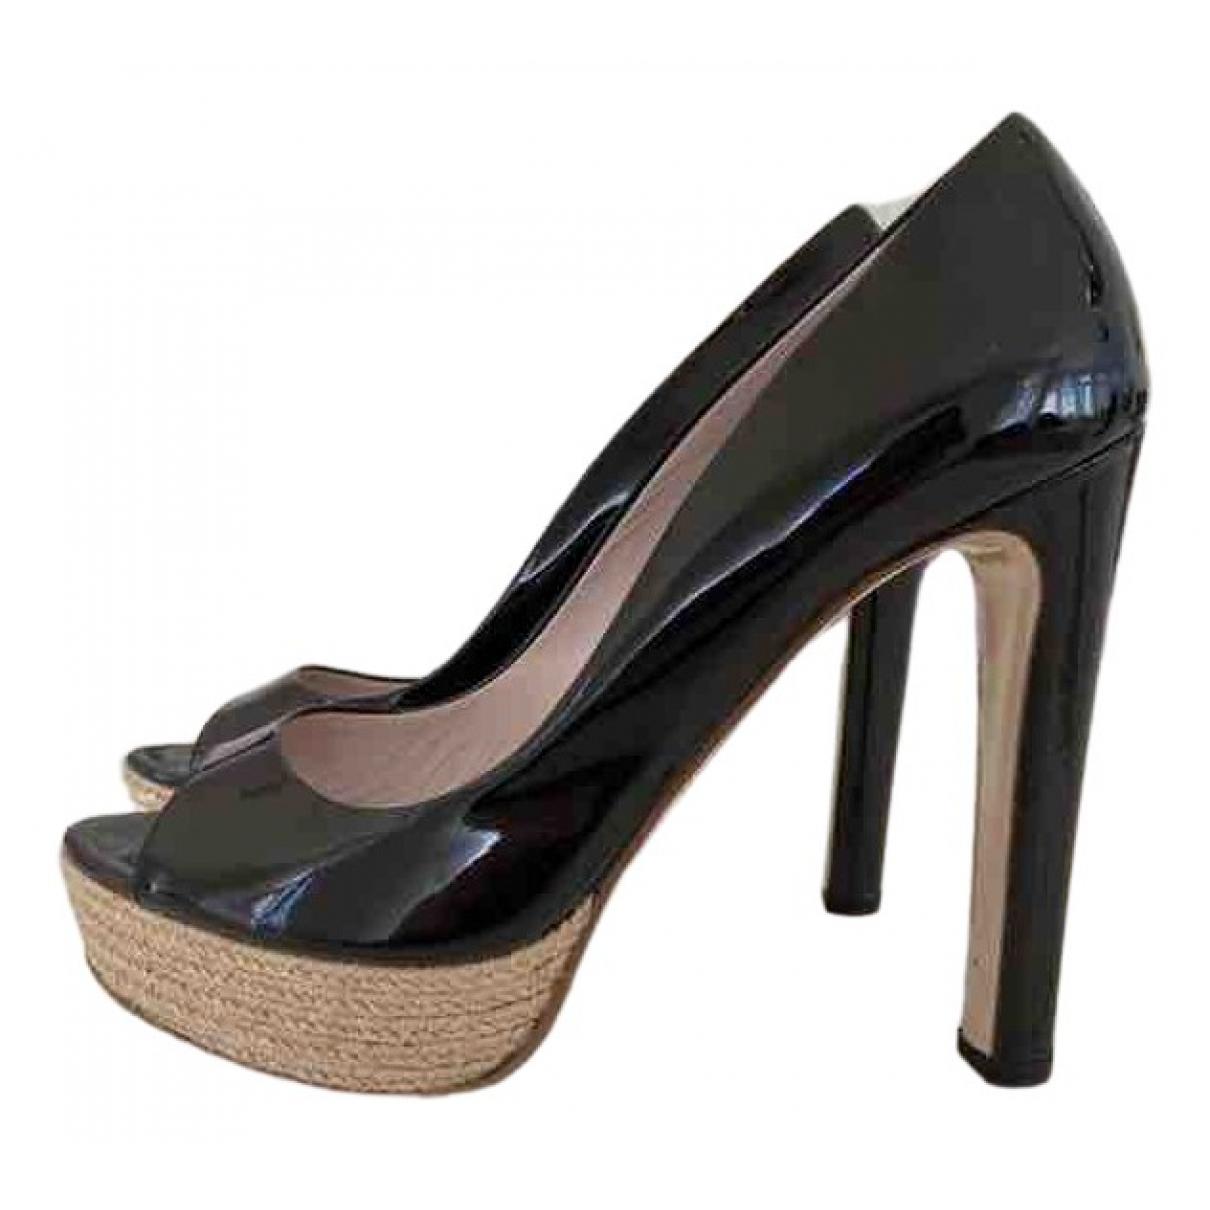 Miu Miu \N Black Patent leather Heels for Women 40.5 EU